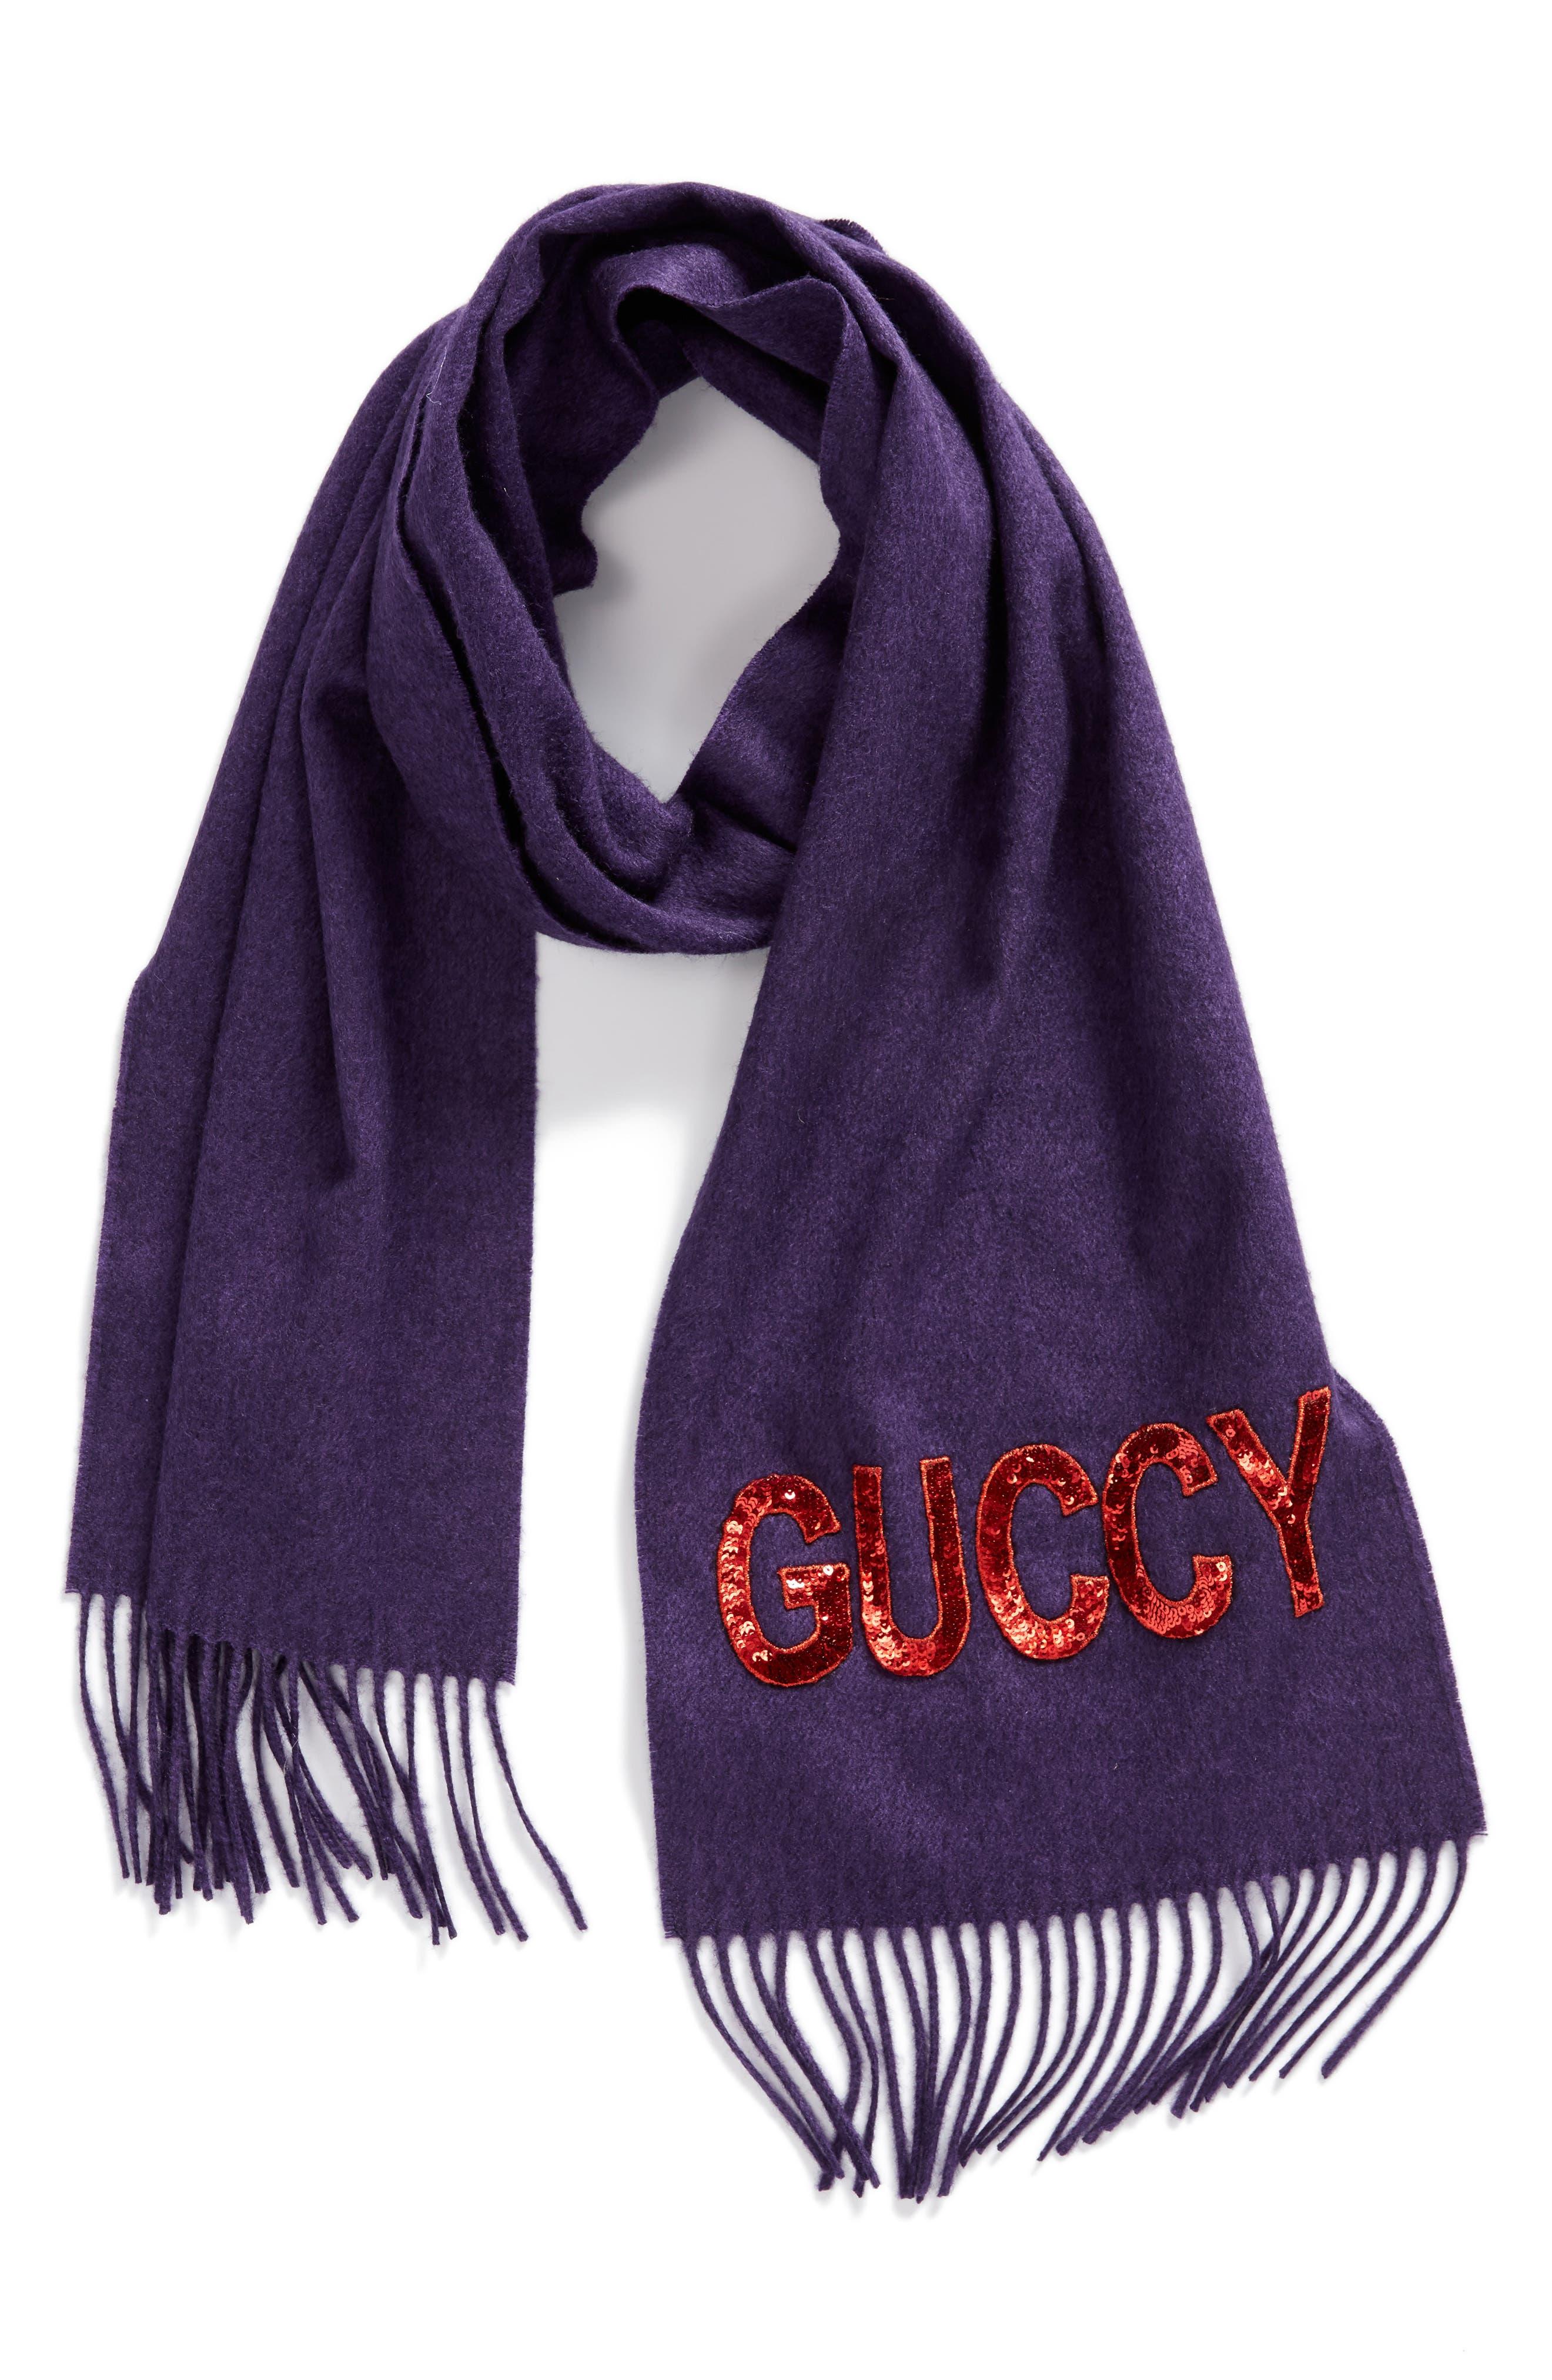 Guccy Sequin Silk & Cashmere Scarf,                             Alternate thumbnail 3, color,                             PARMA VIOLET